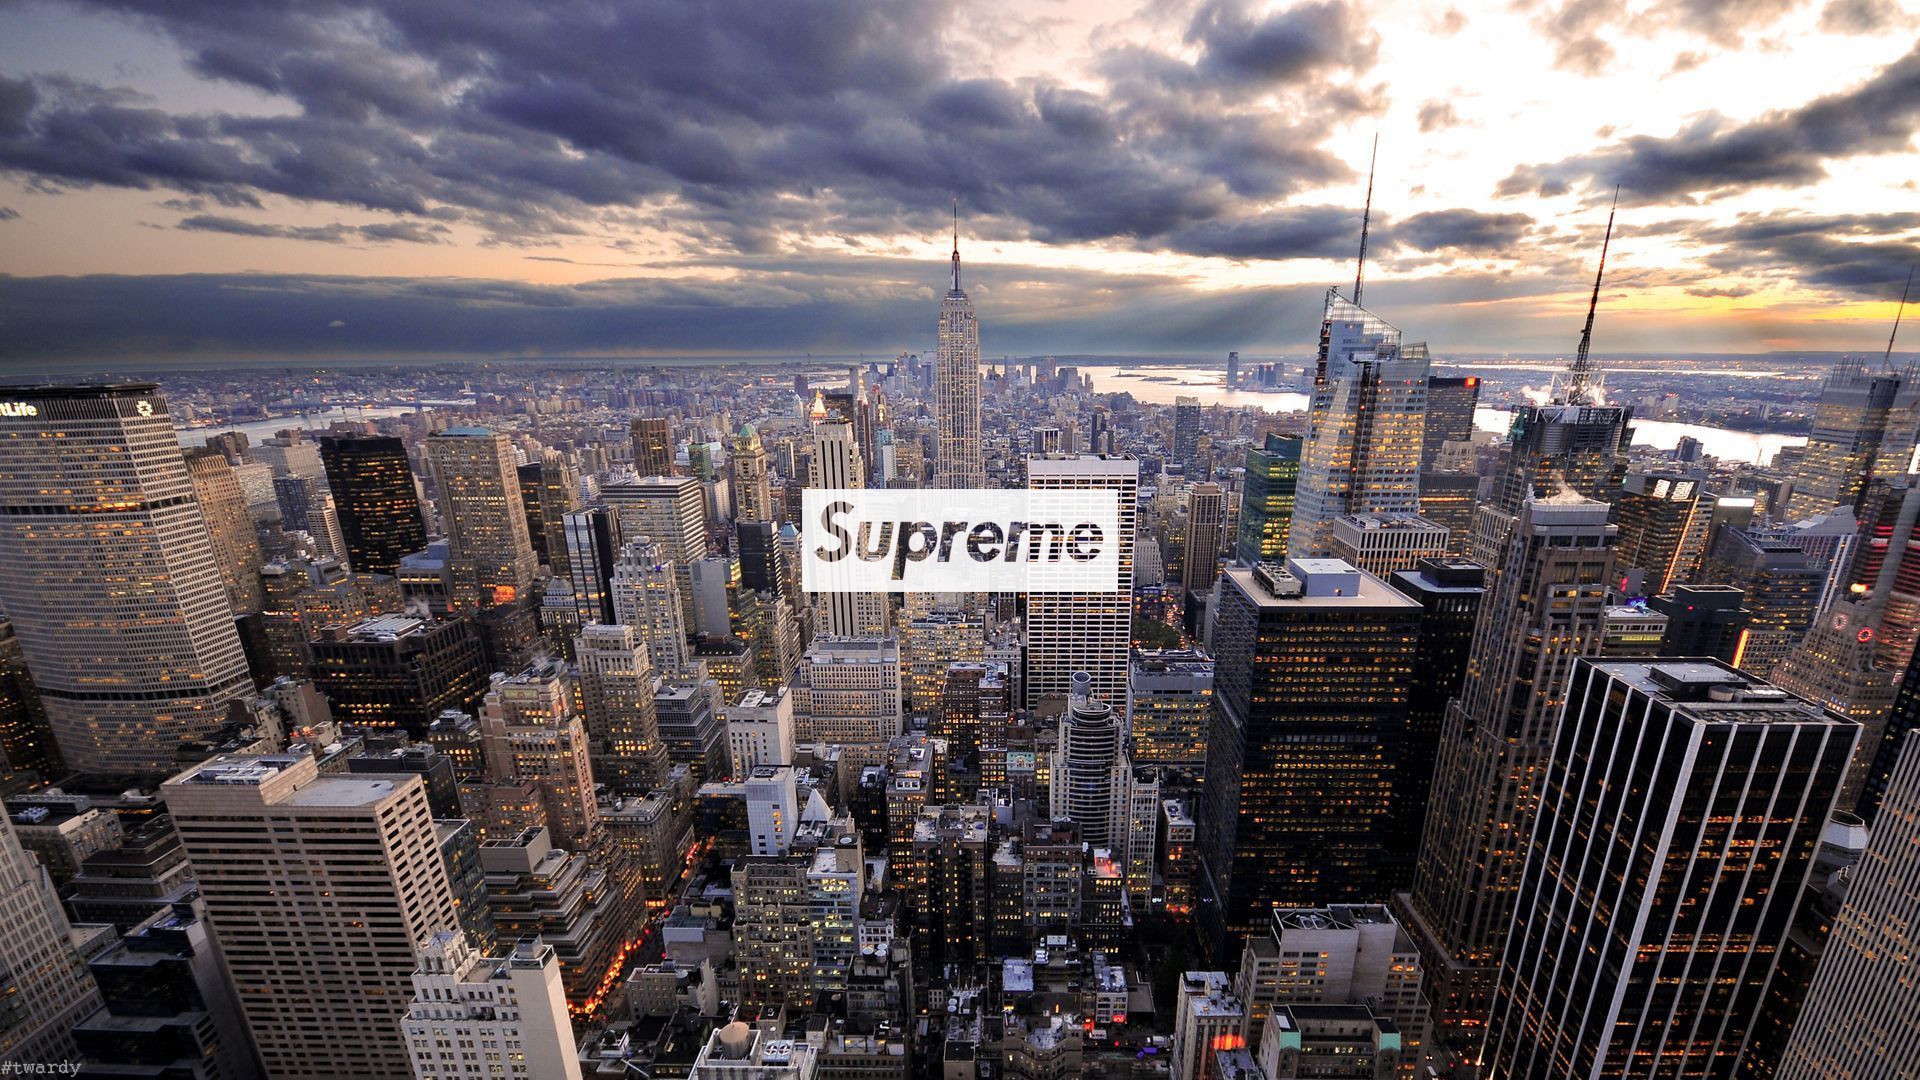 New-York город небоскребы высота the city skyscrapers height подборки